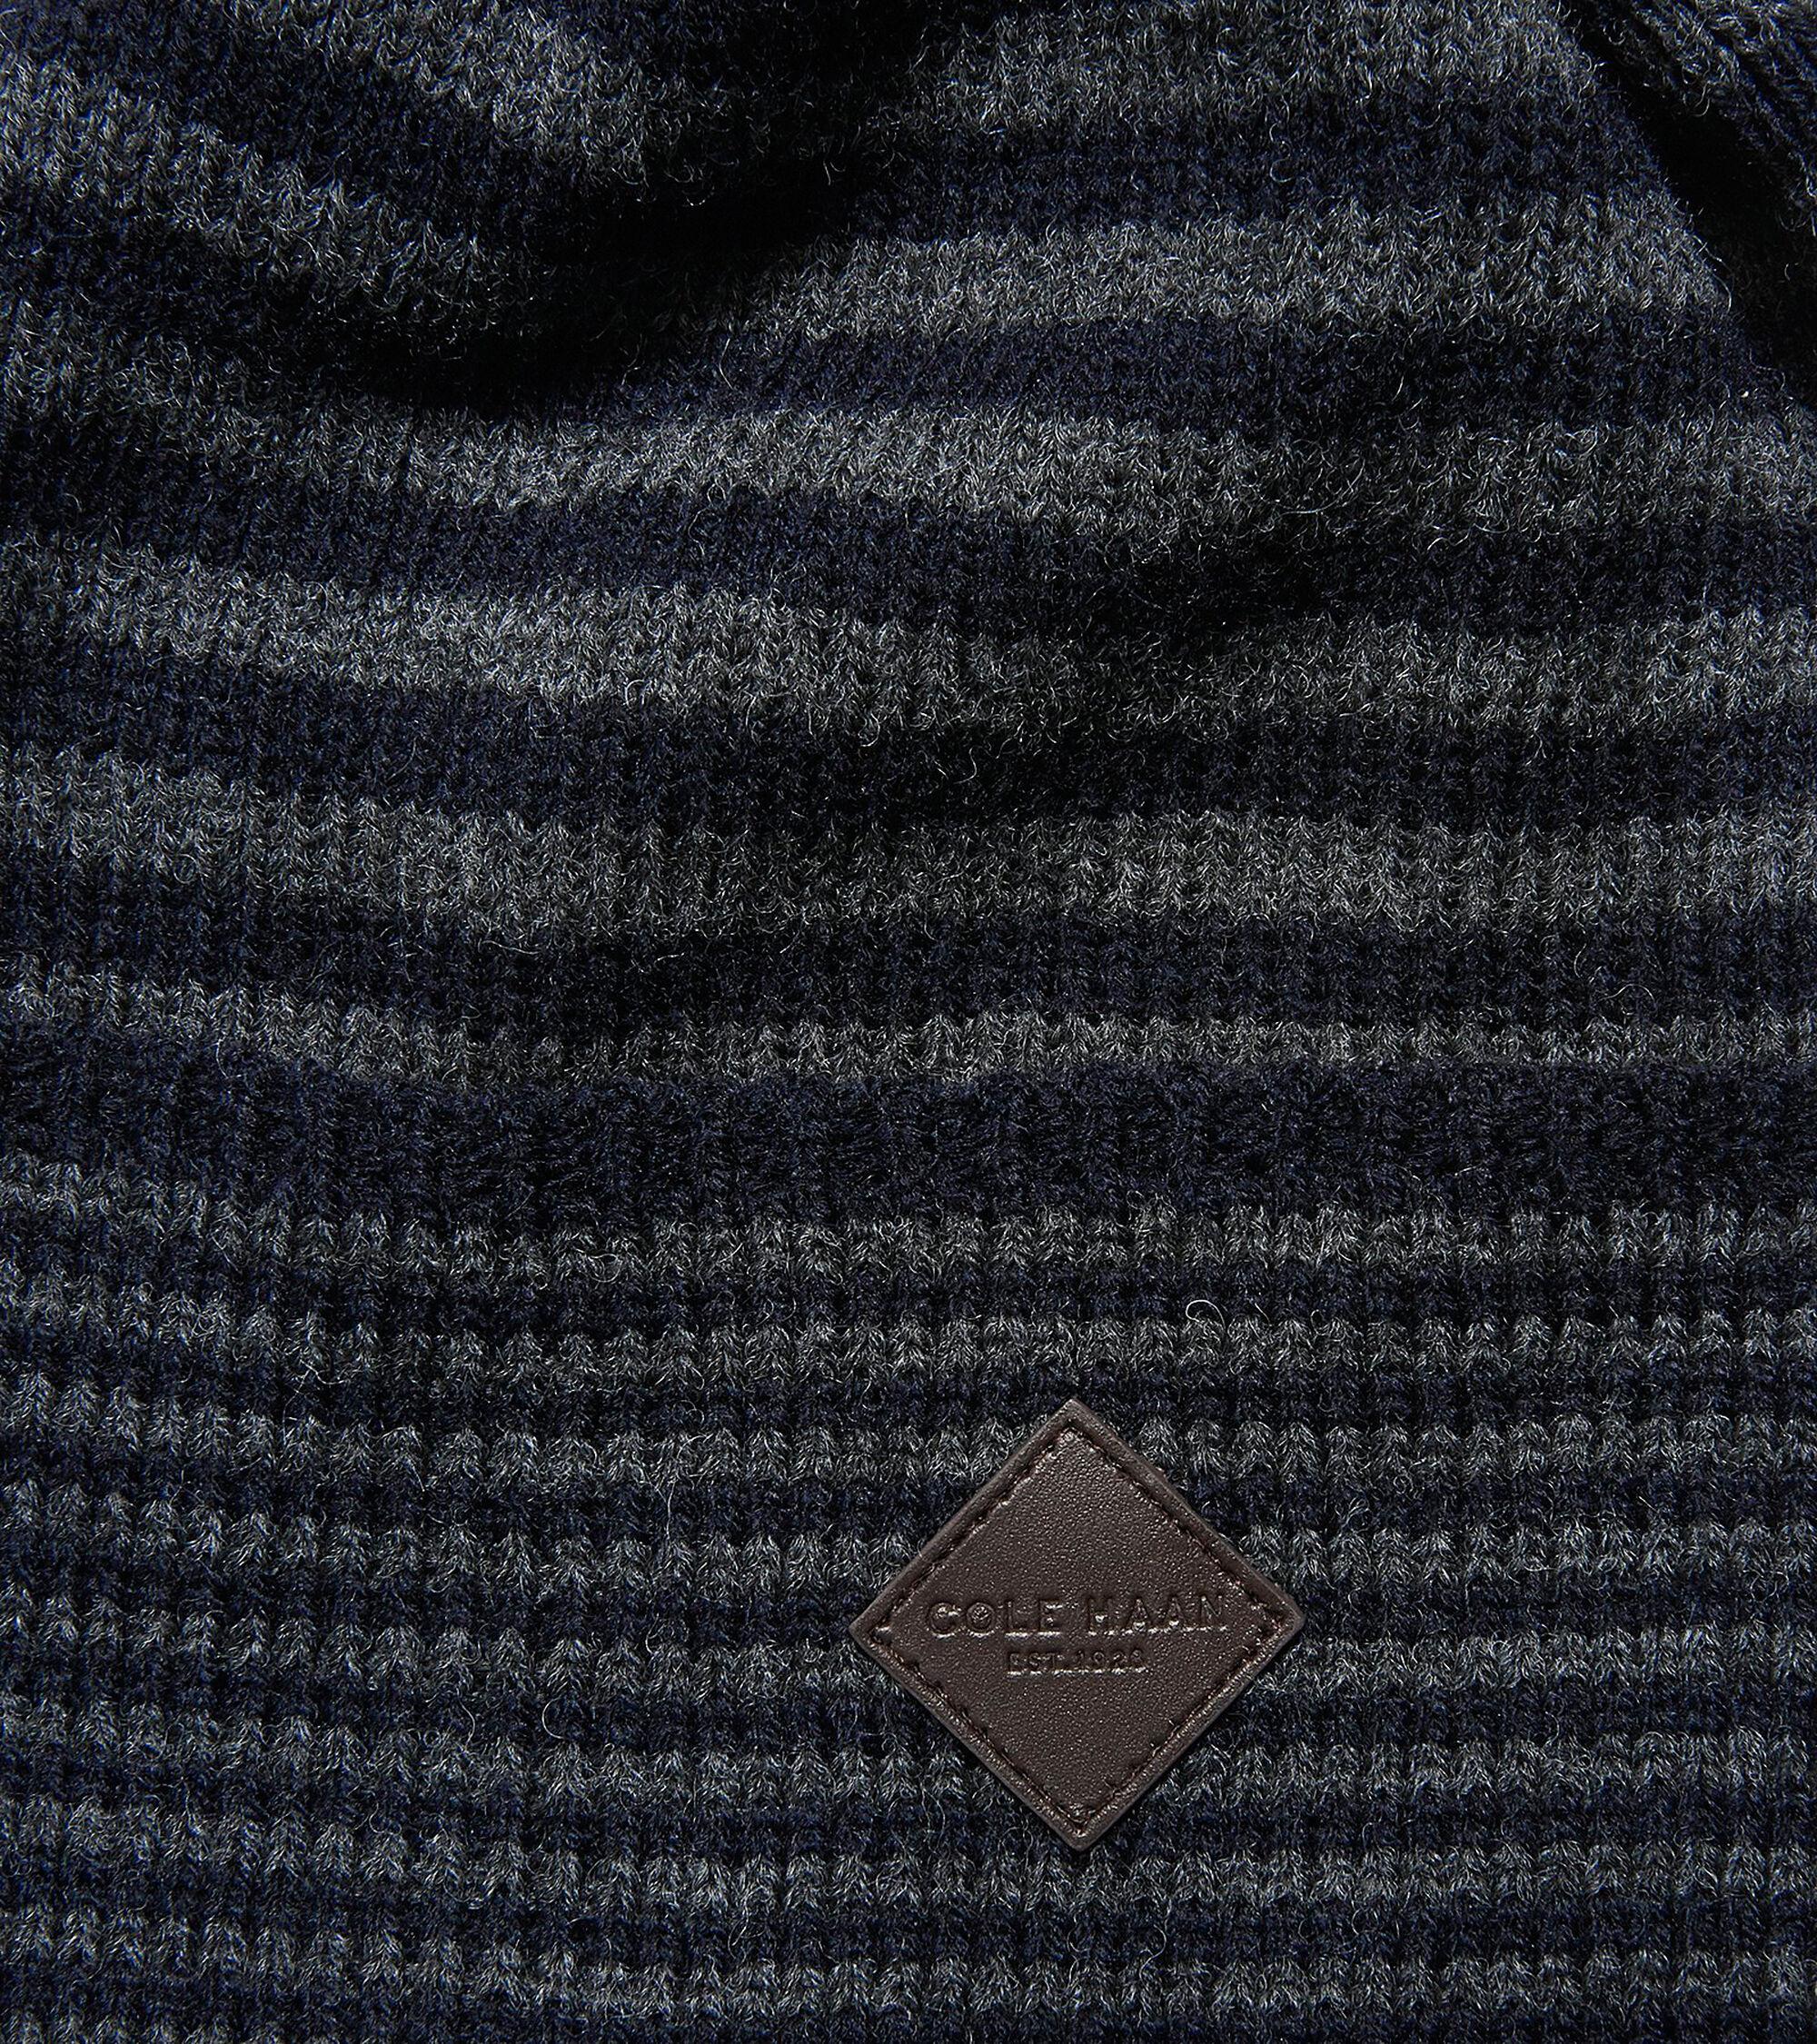 57e3a4104f3 Men s Double Stripe Cuff Hat in Marine-Charcoal